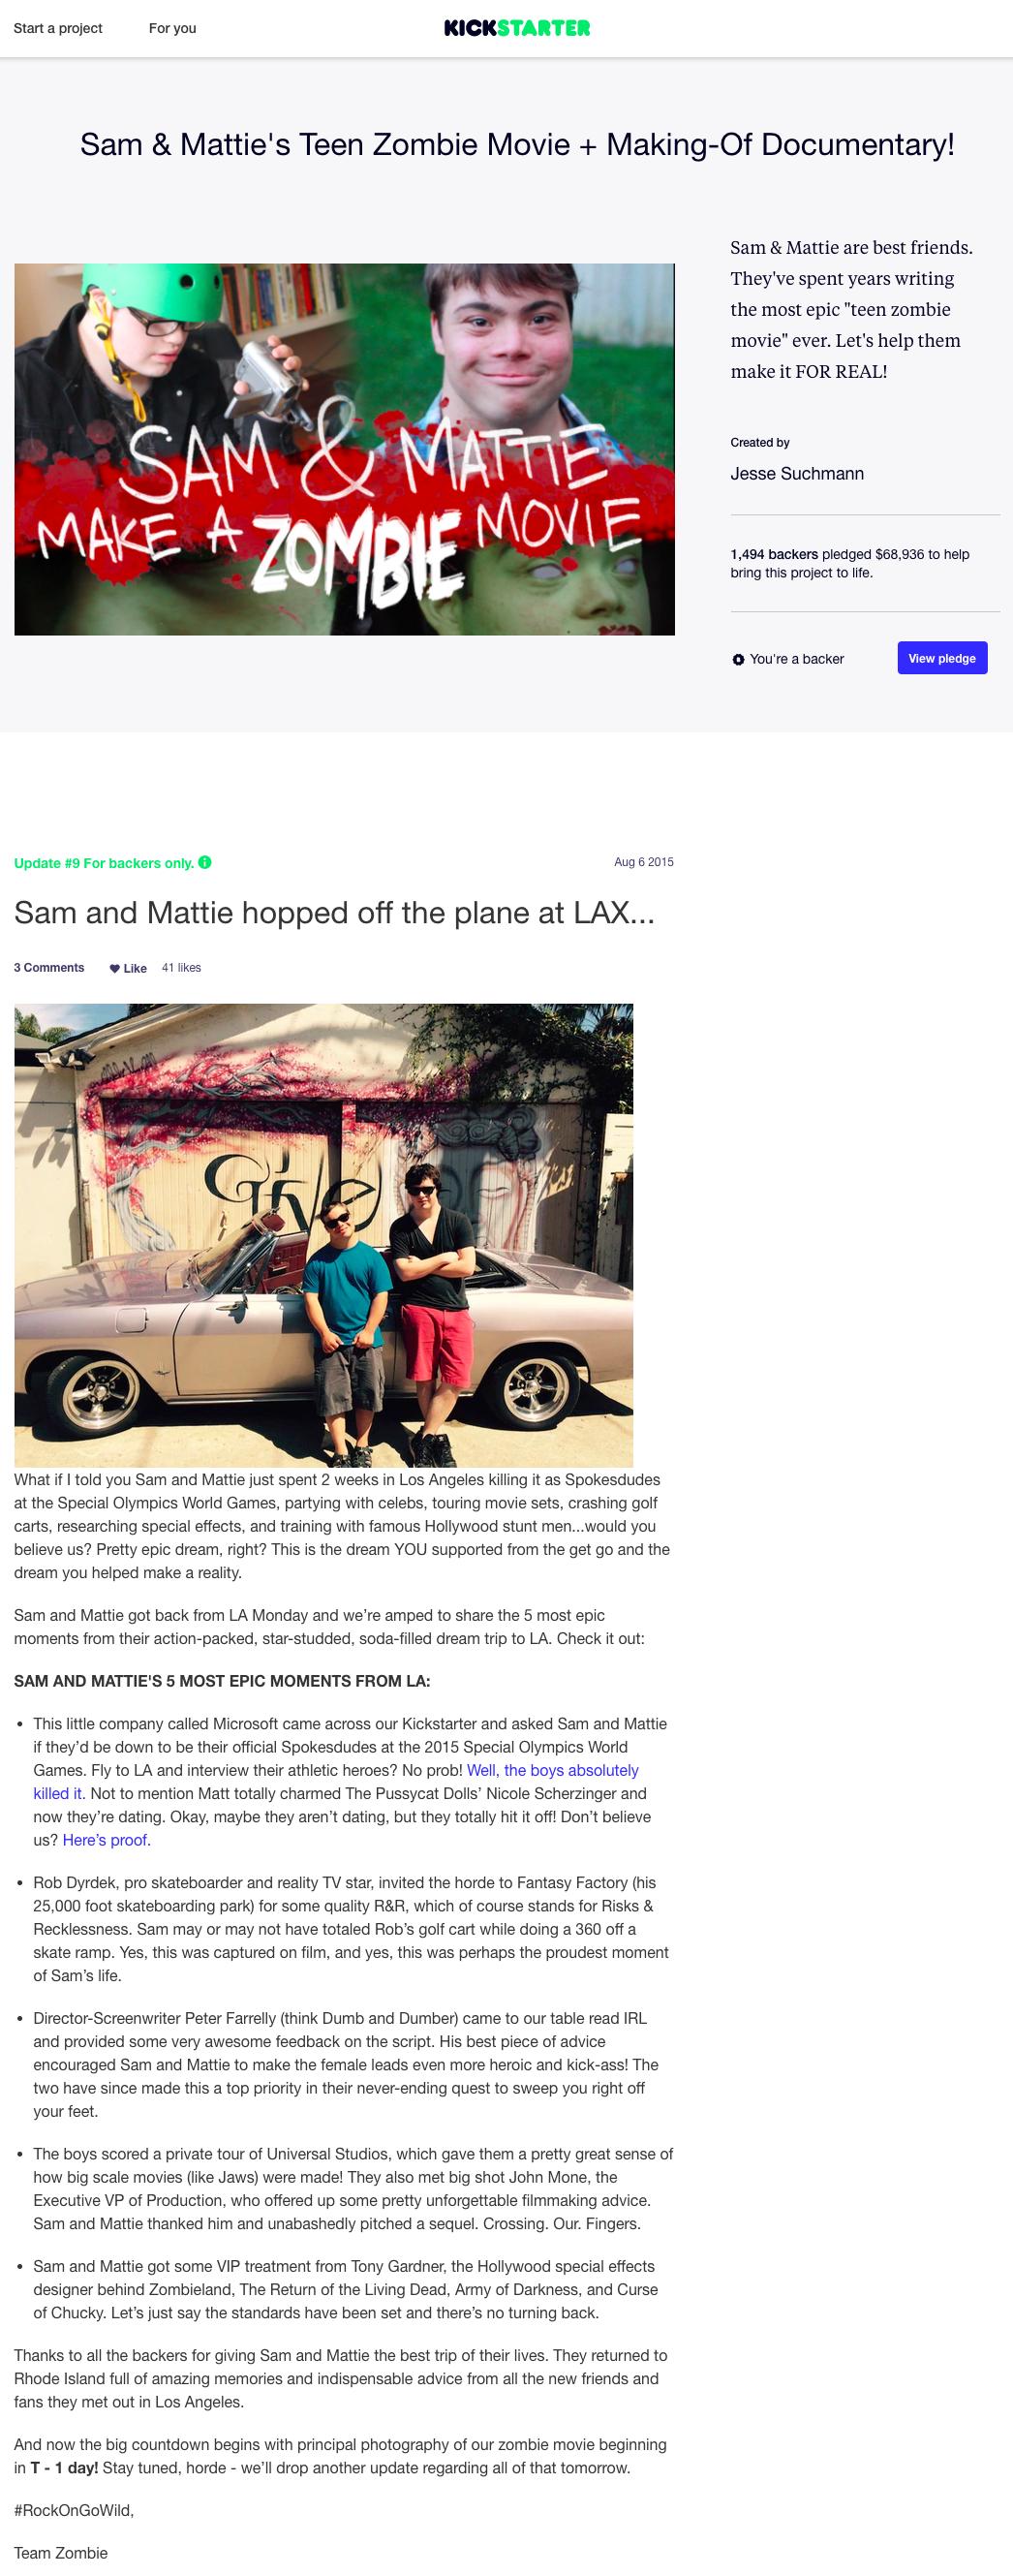 Kickstarter Article_Sam and Mattie's Teen Zombie Movie.png